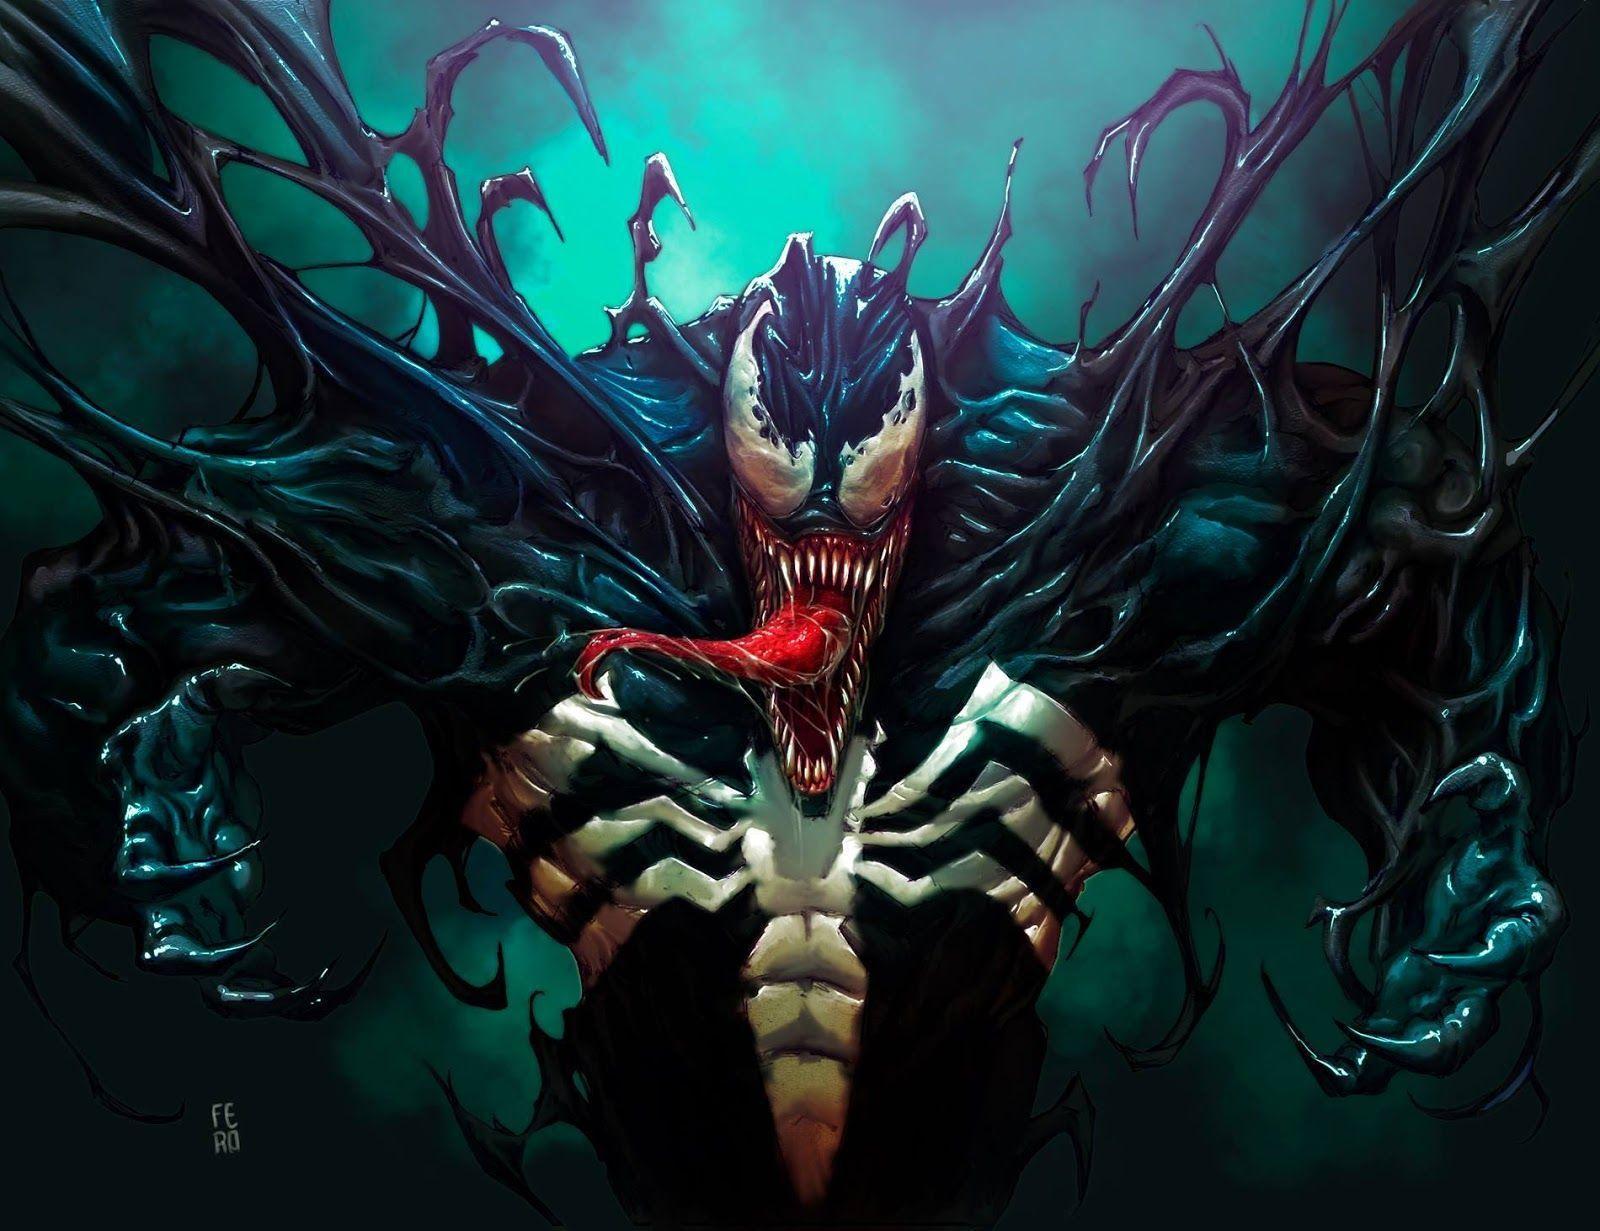 Marvel Venom Wallpapers Top Free Marvel Venom Backgrounds Wallpaperaccess